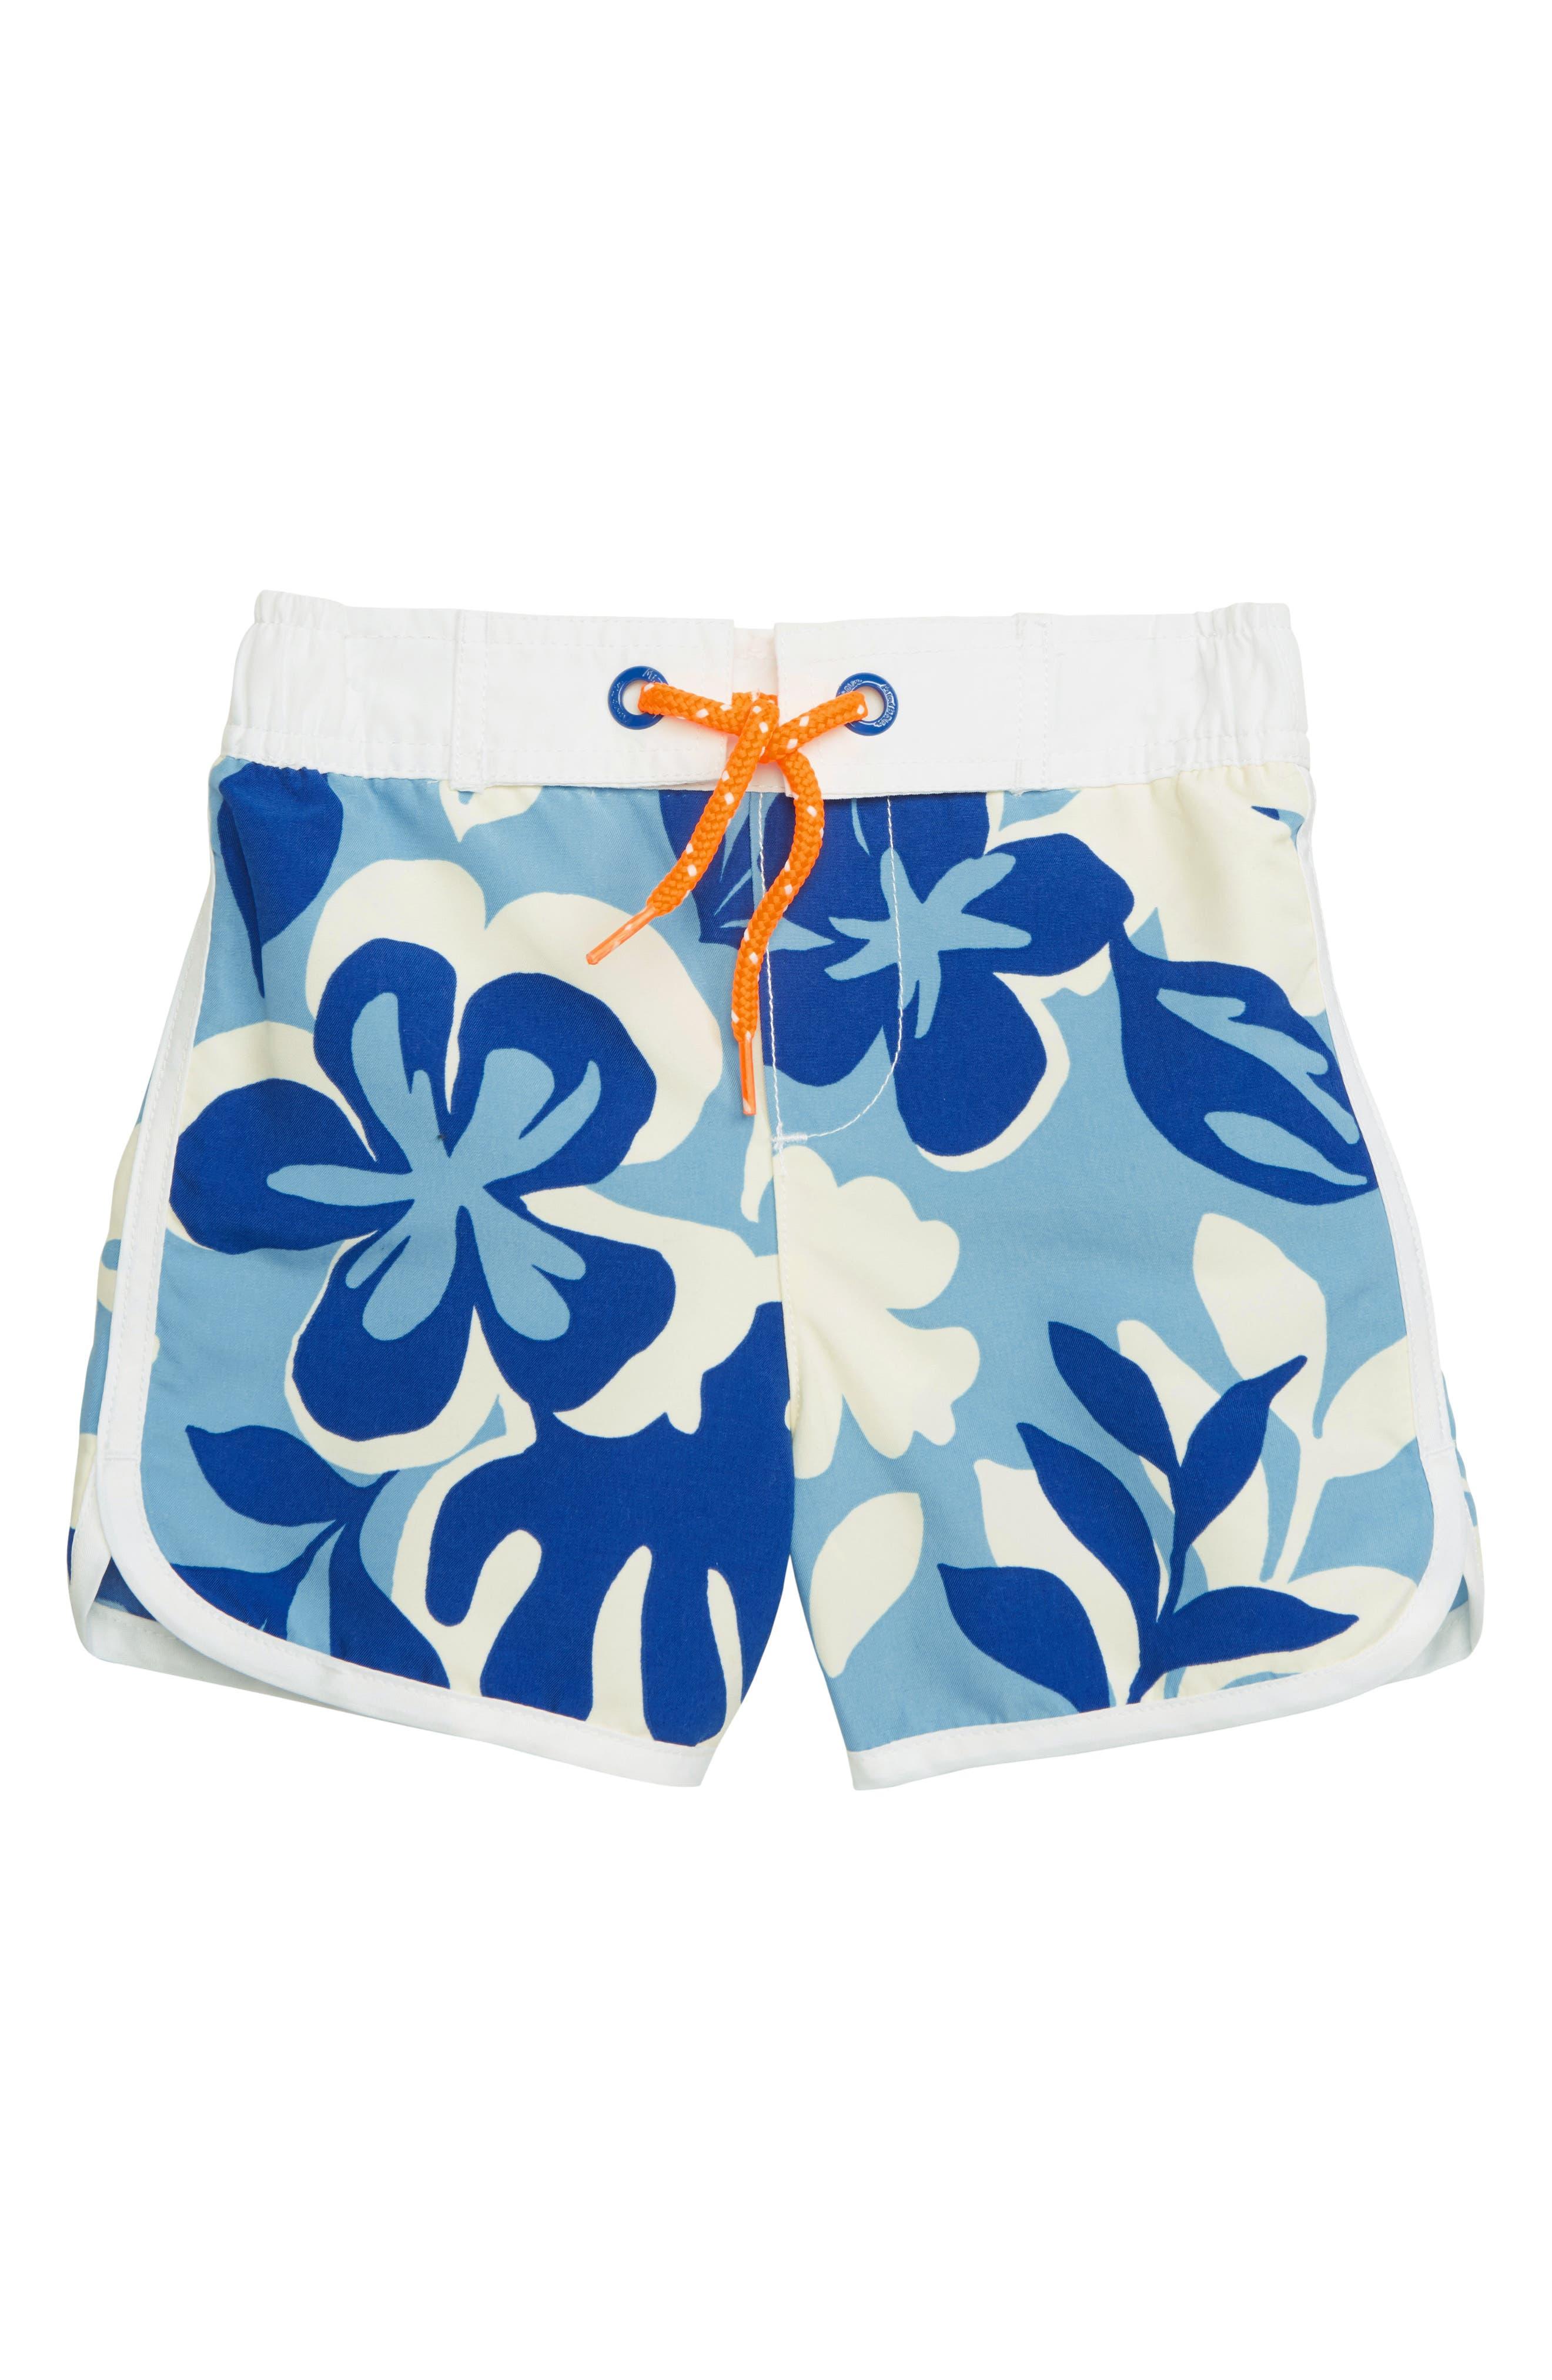 Toddler Boys Mini Boden Surf Hawaiian Swim Trunks Size 34Y  Blue